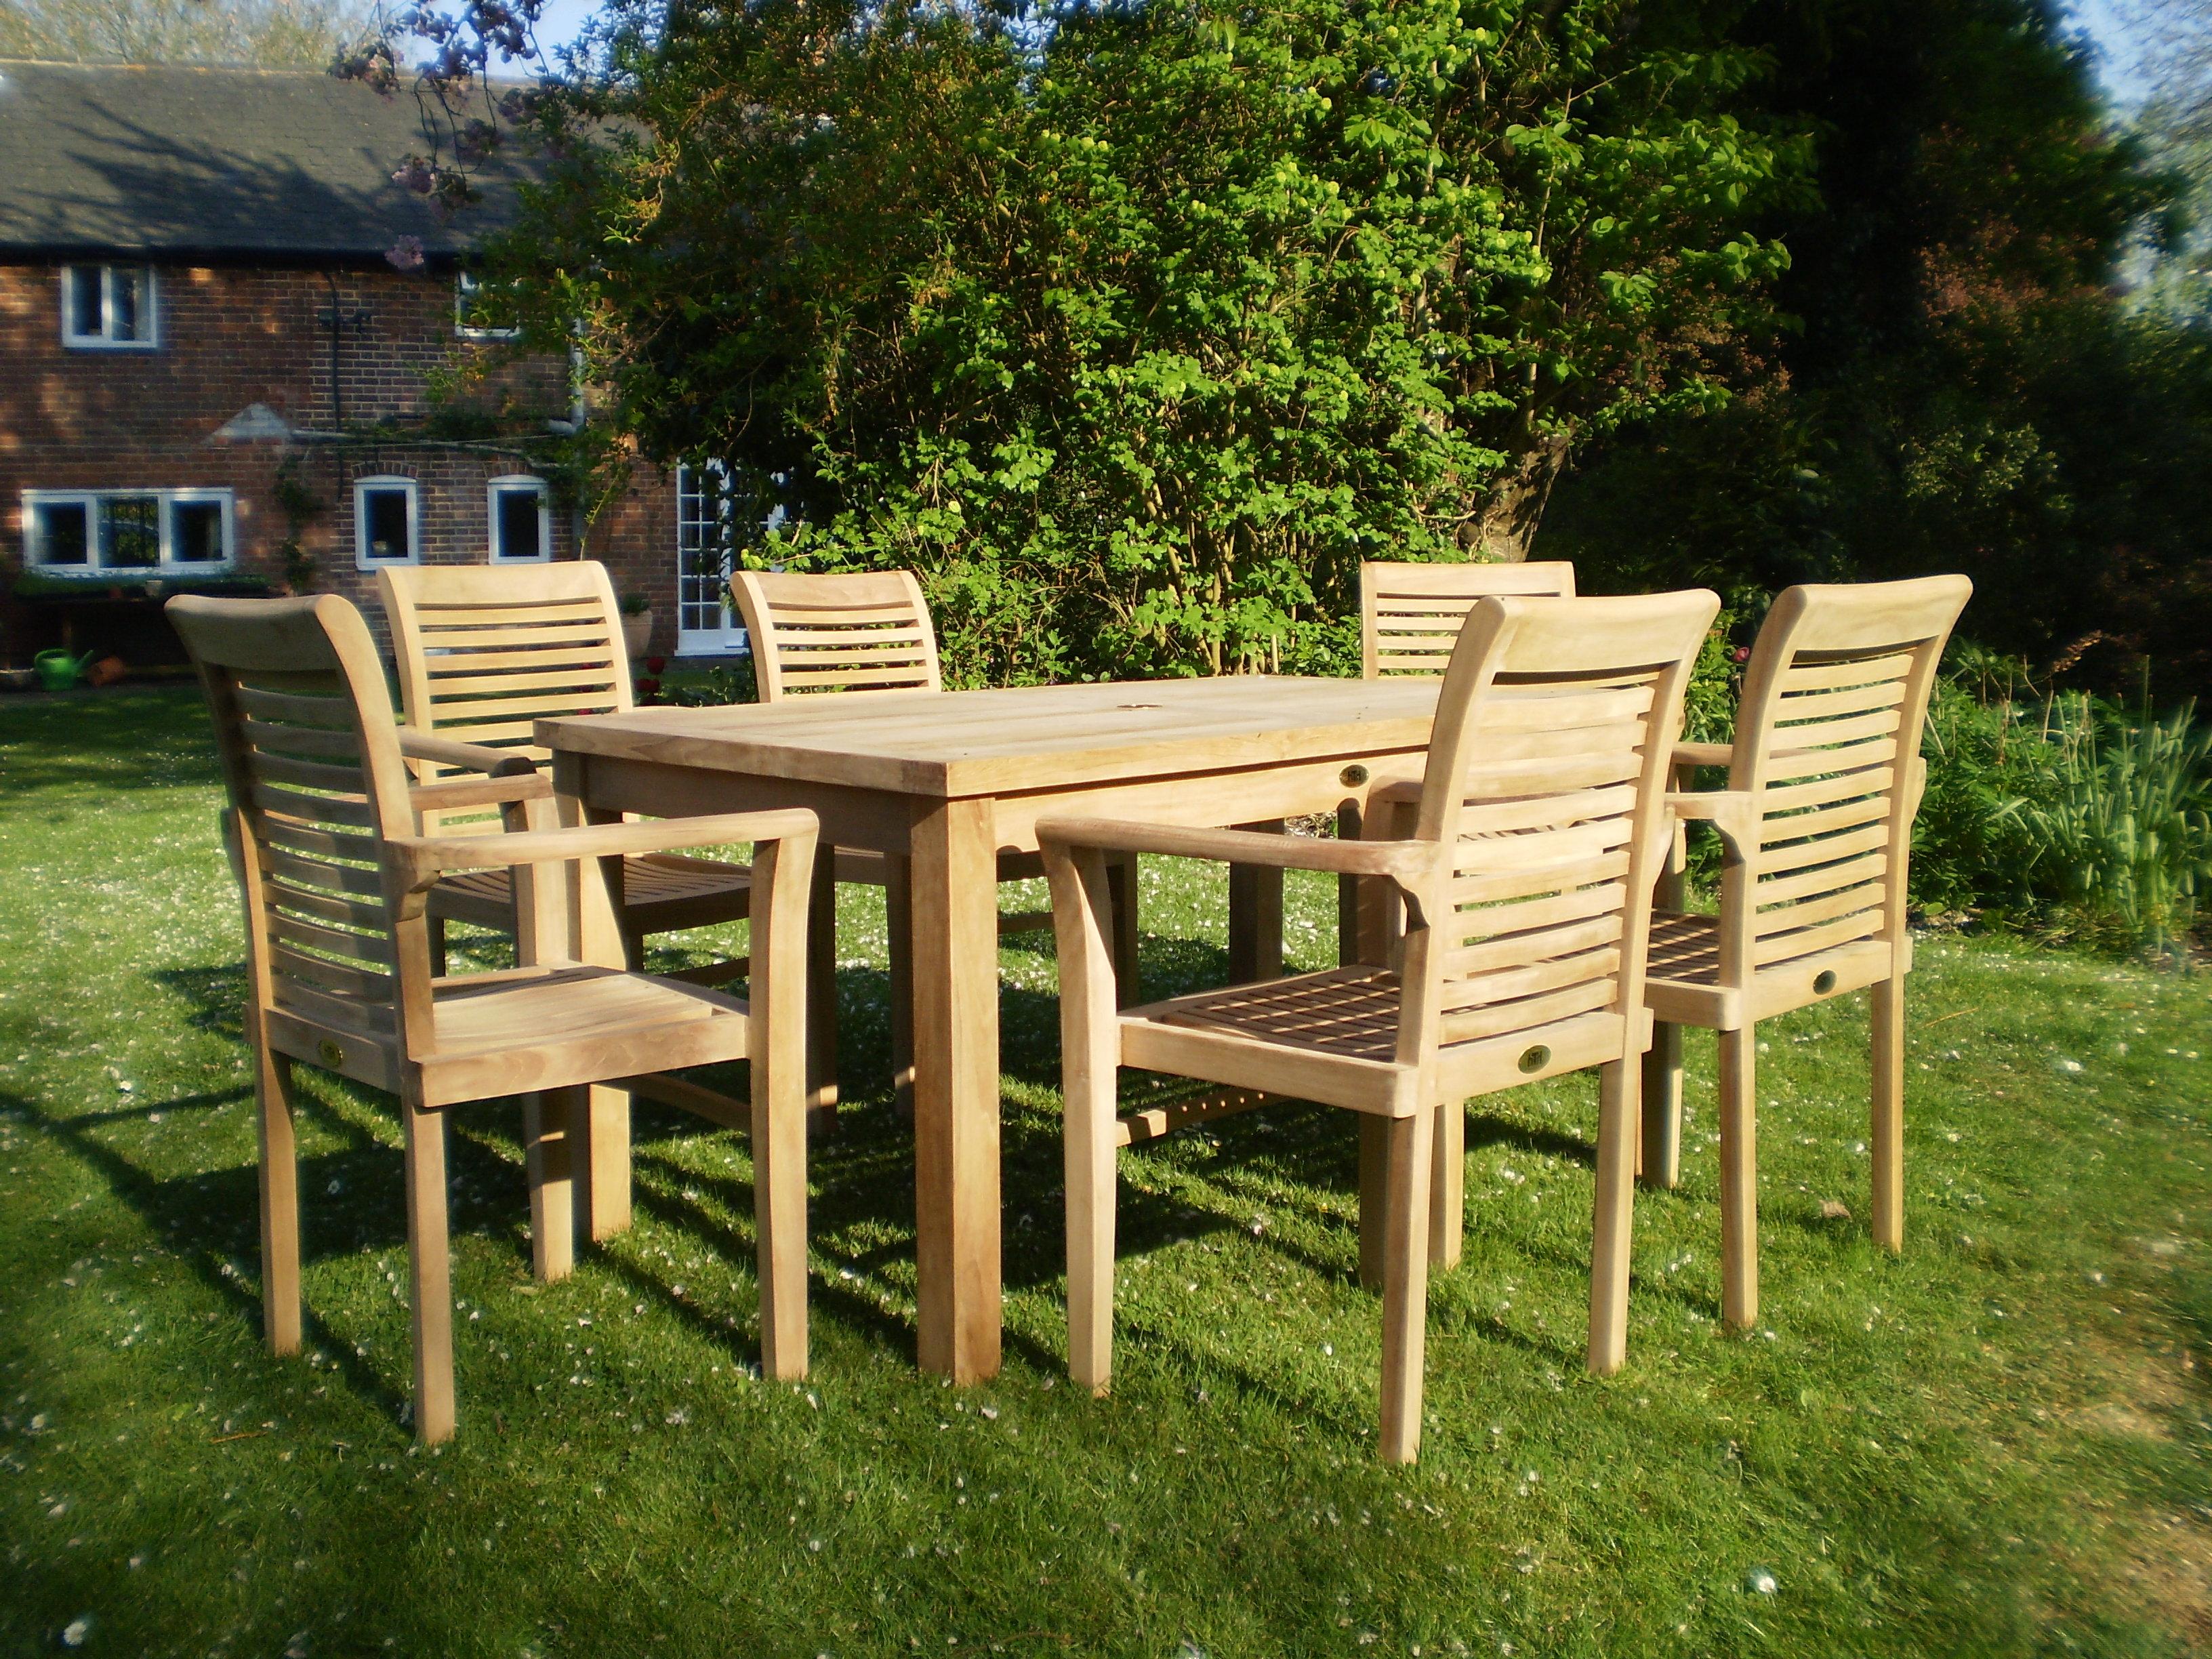 Teak Patio Furniture - Chairs and Tables UK - Teak Garden ...